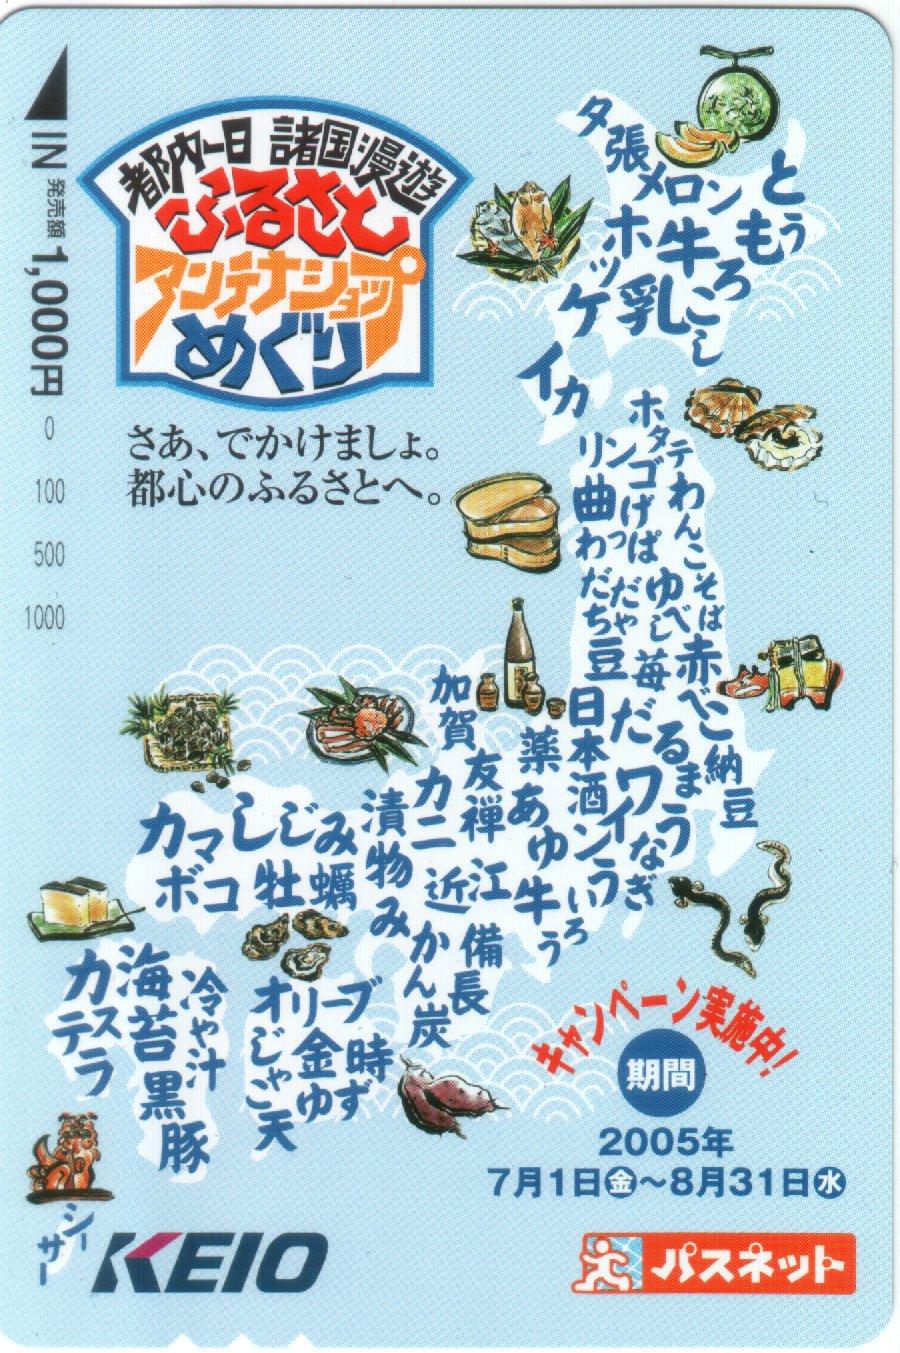 Hometown Cuisine Campaign